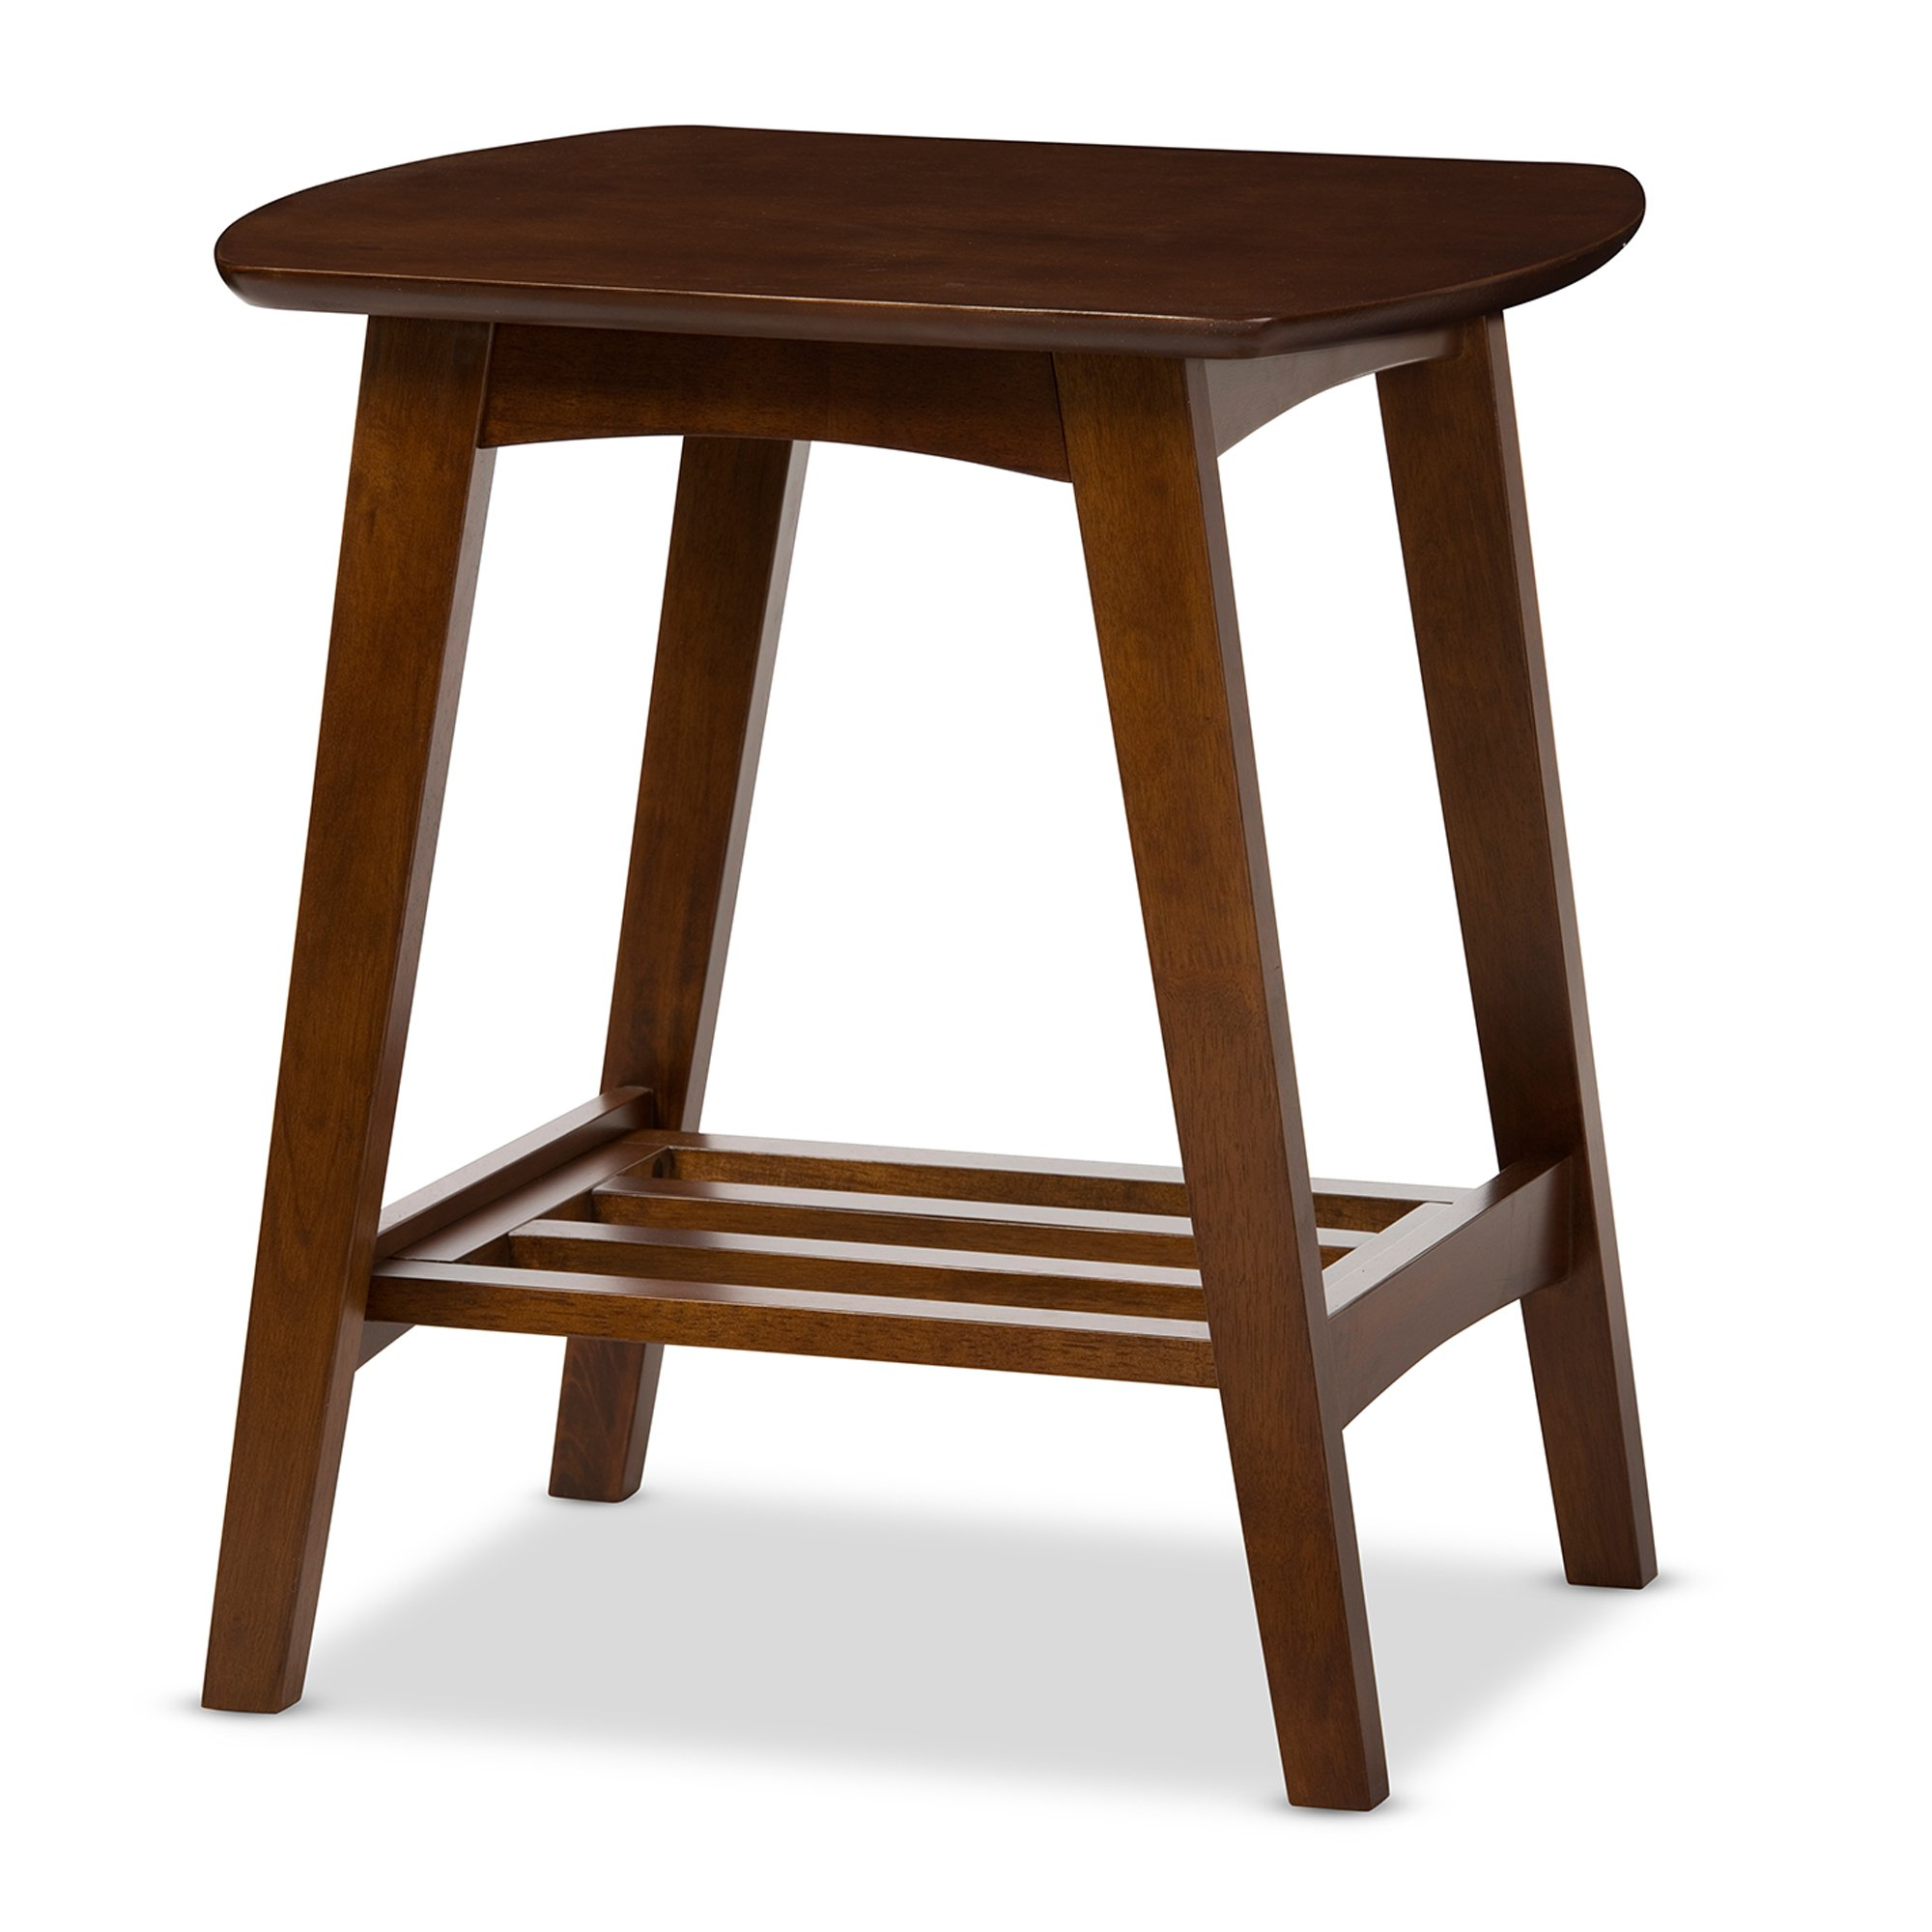 Baxton Studio Sacramento Mid-Century Modern Scandinavian Style End Table, Dark Walnut by Baxton Studio